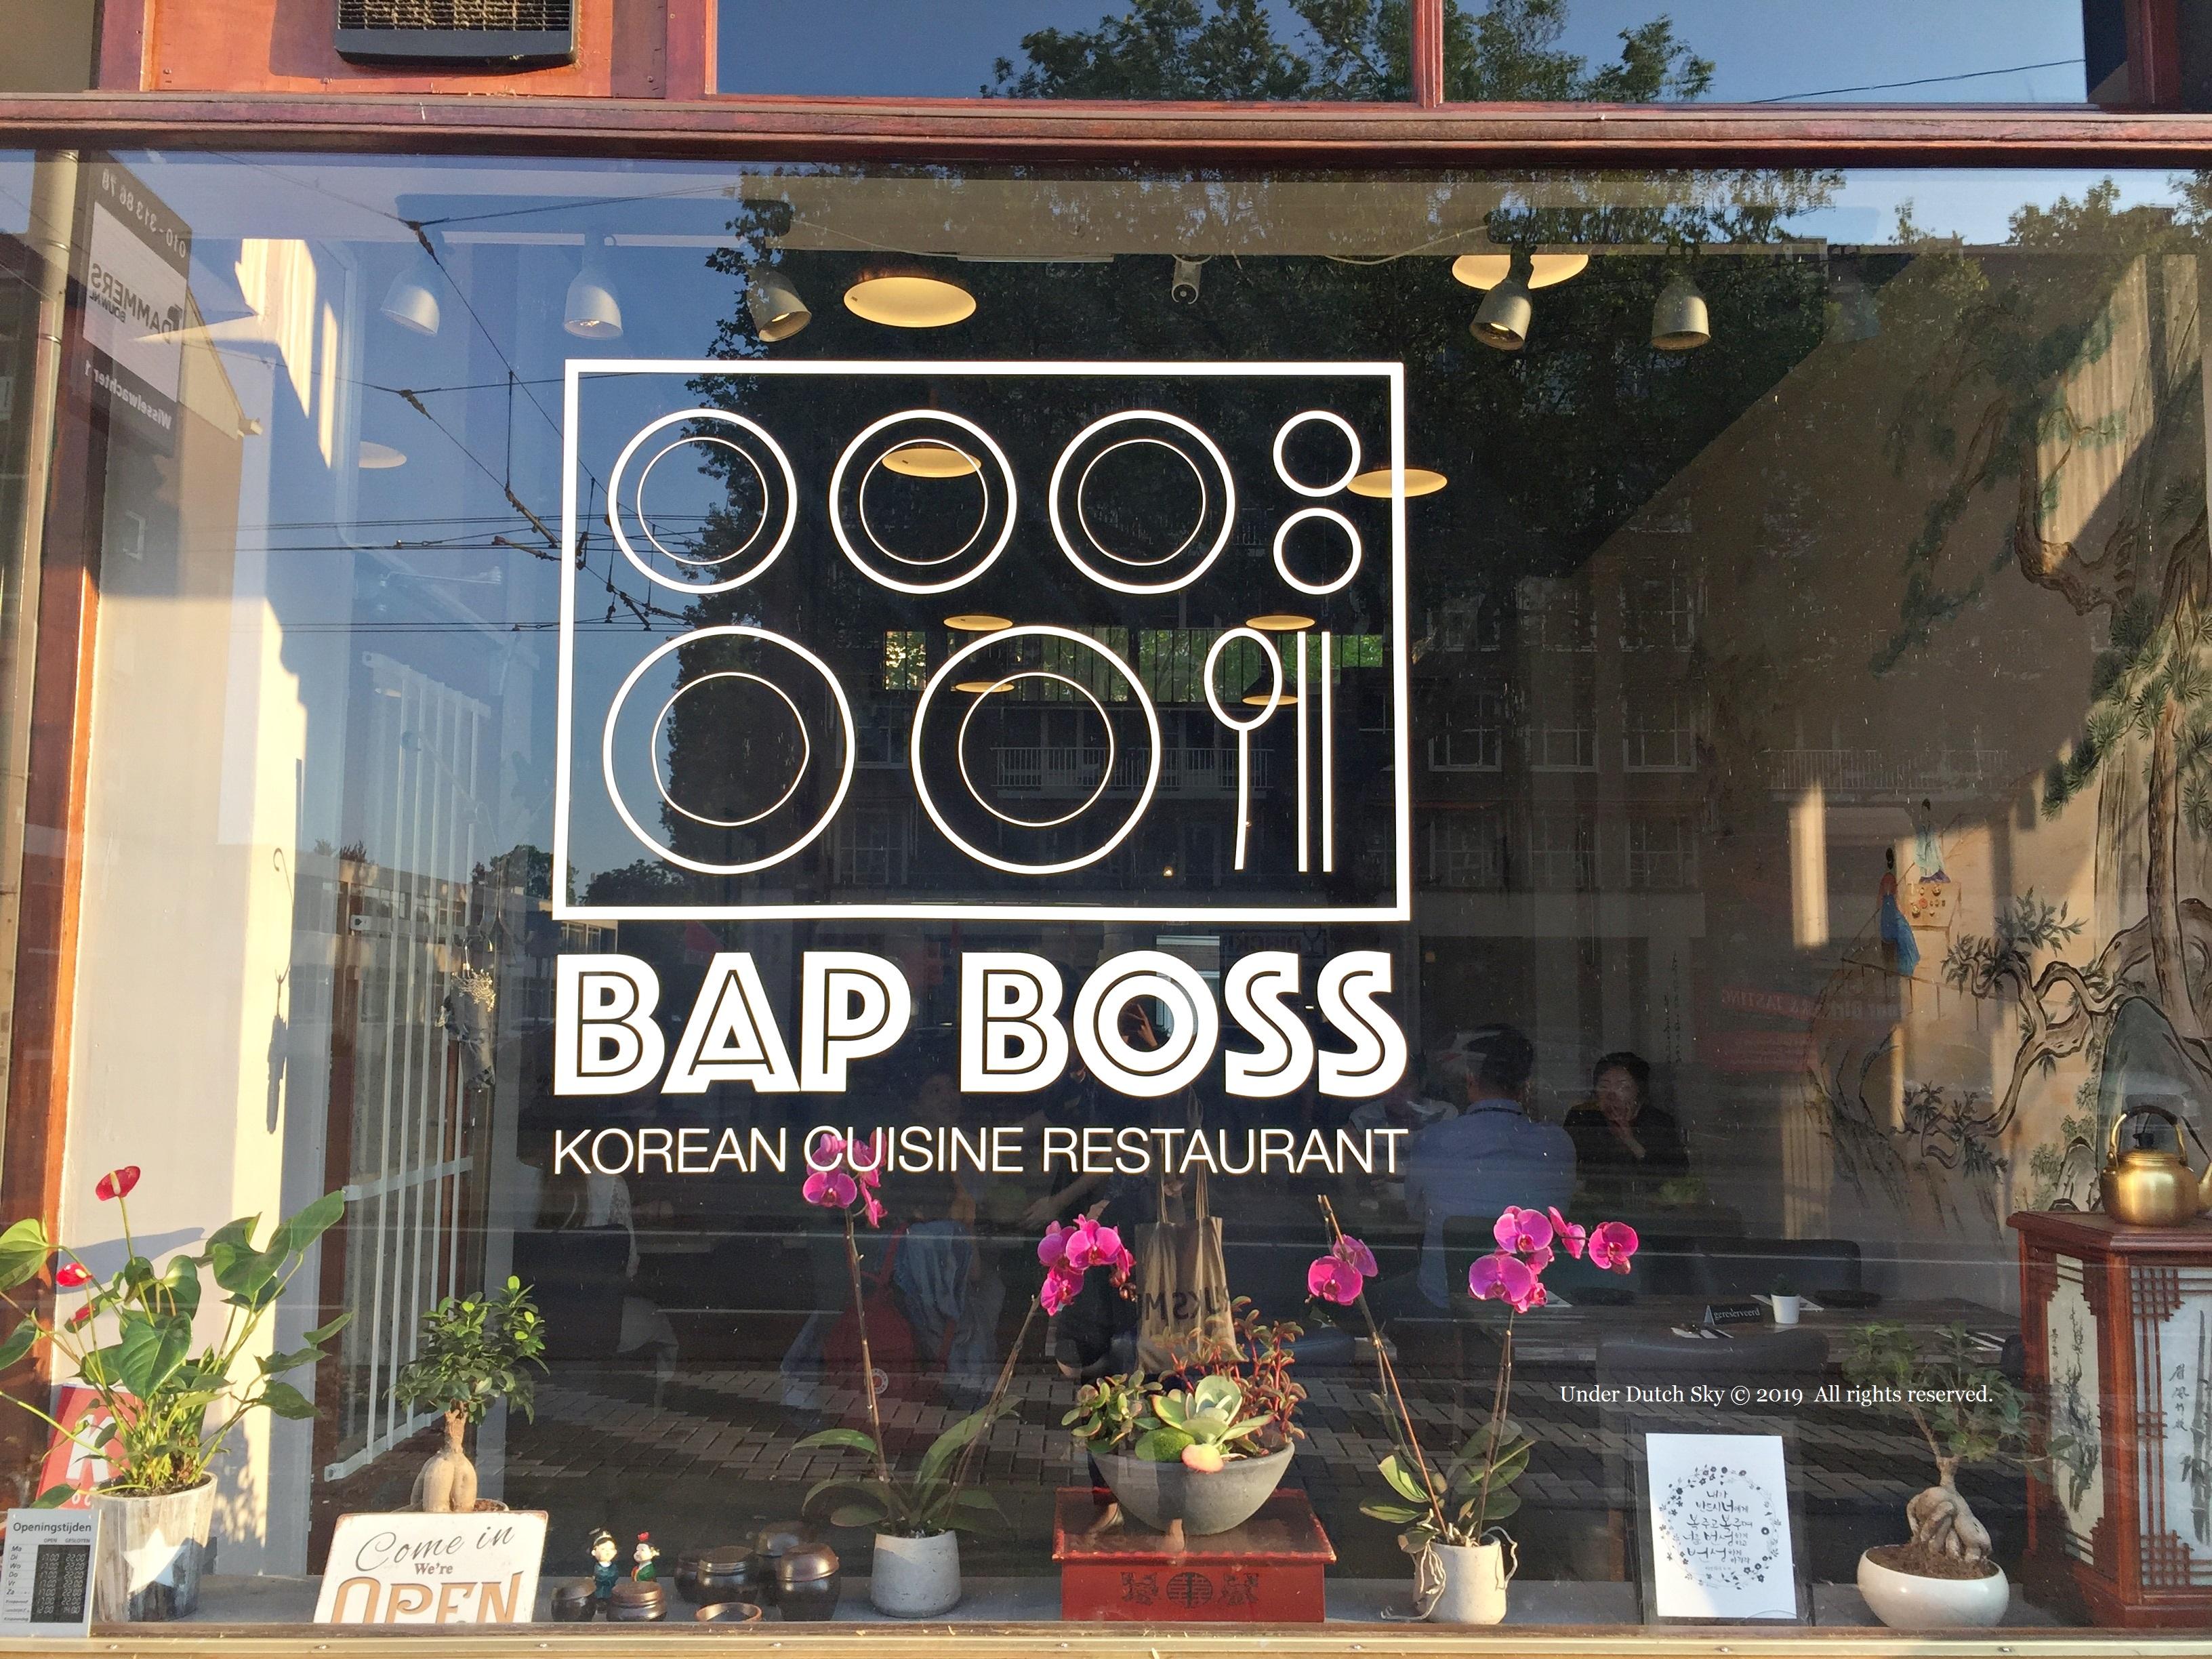 Best Korean Food in Rotterdam: Bap Boss